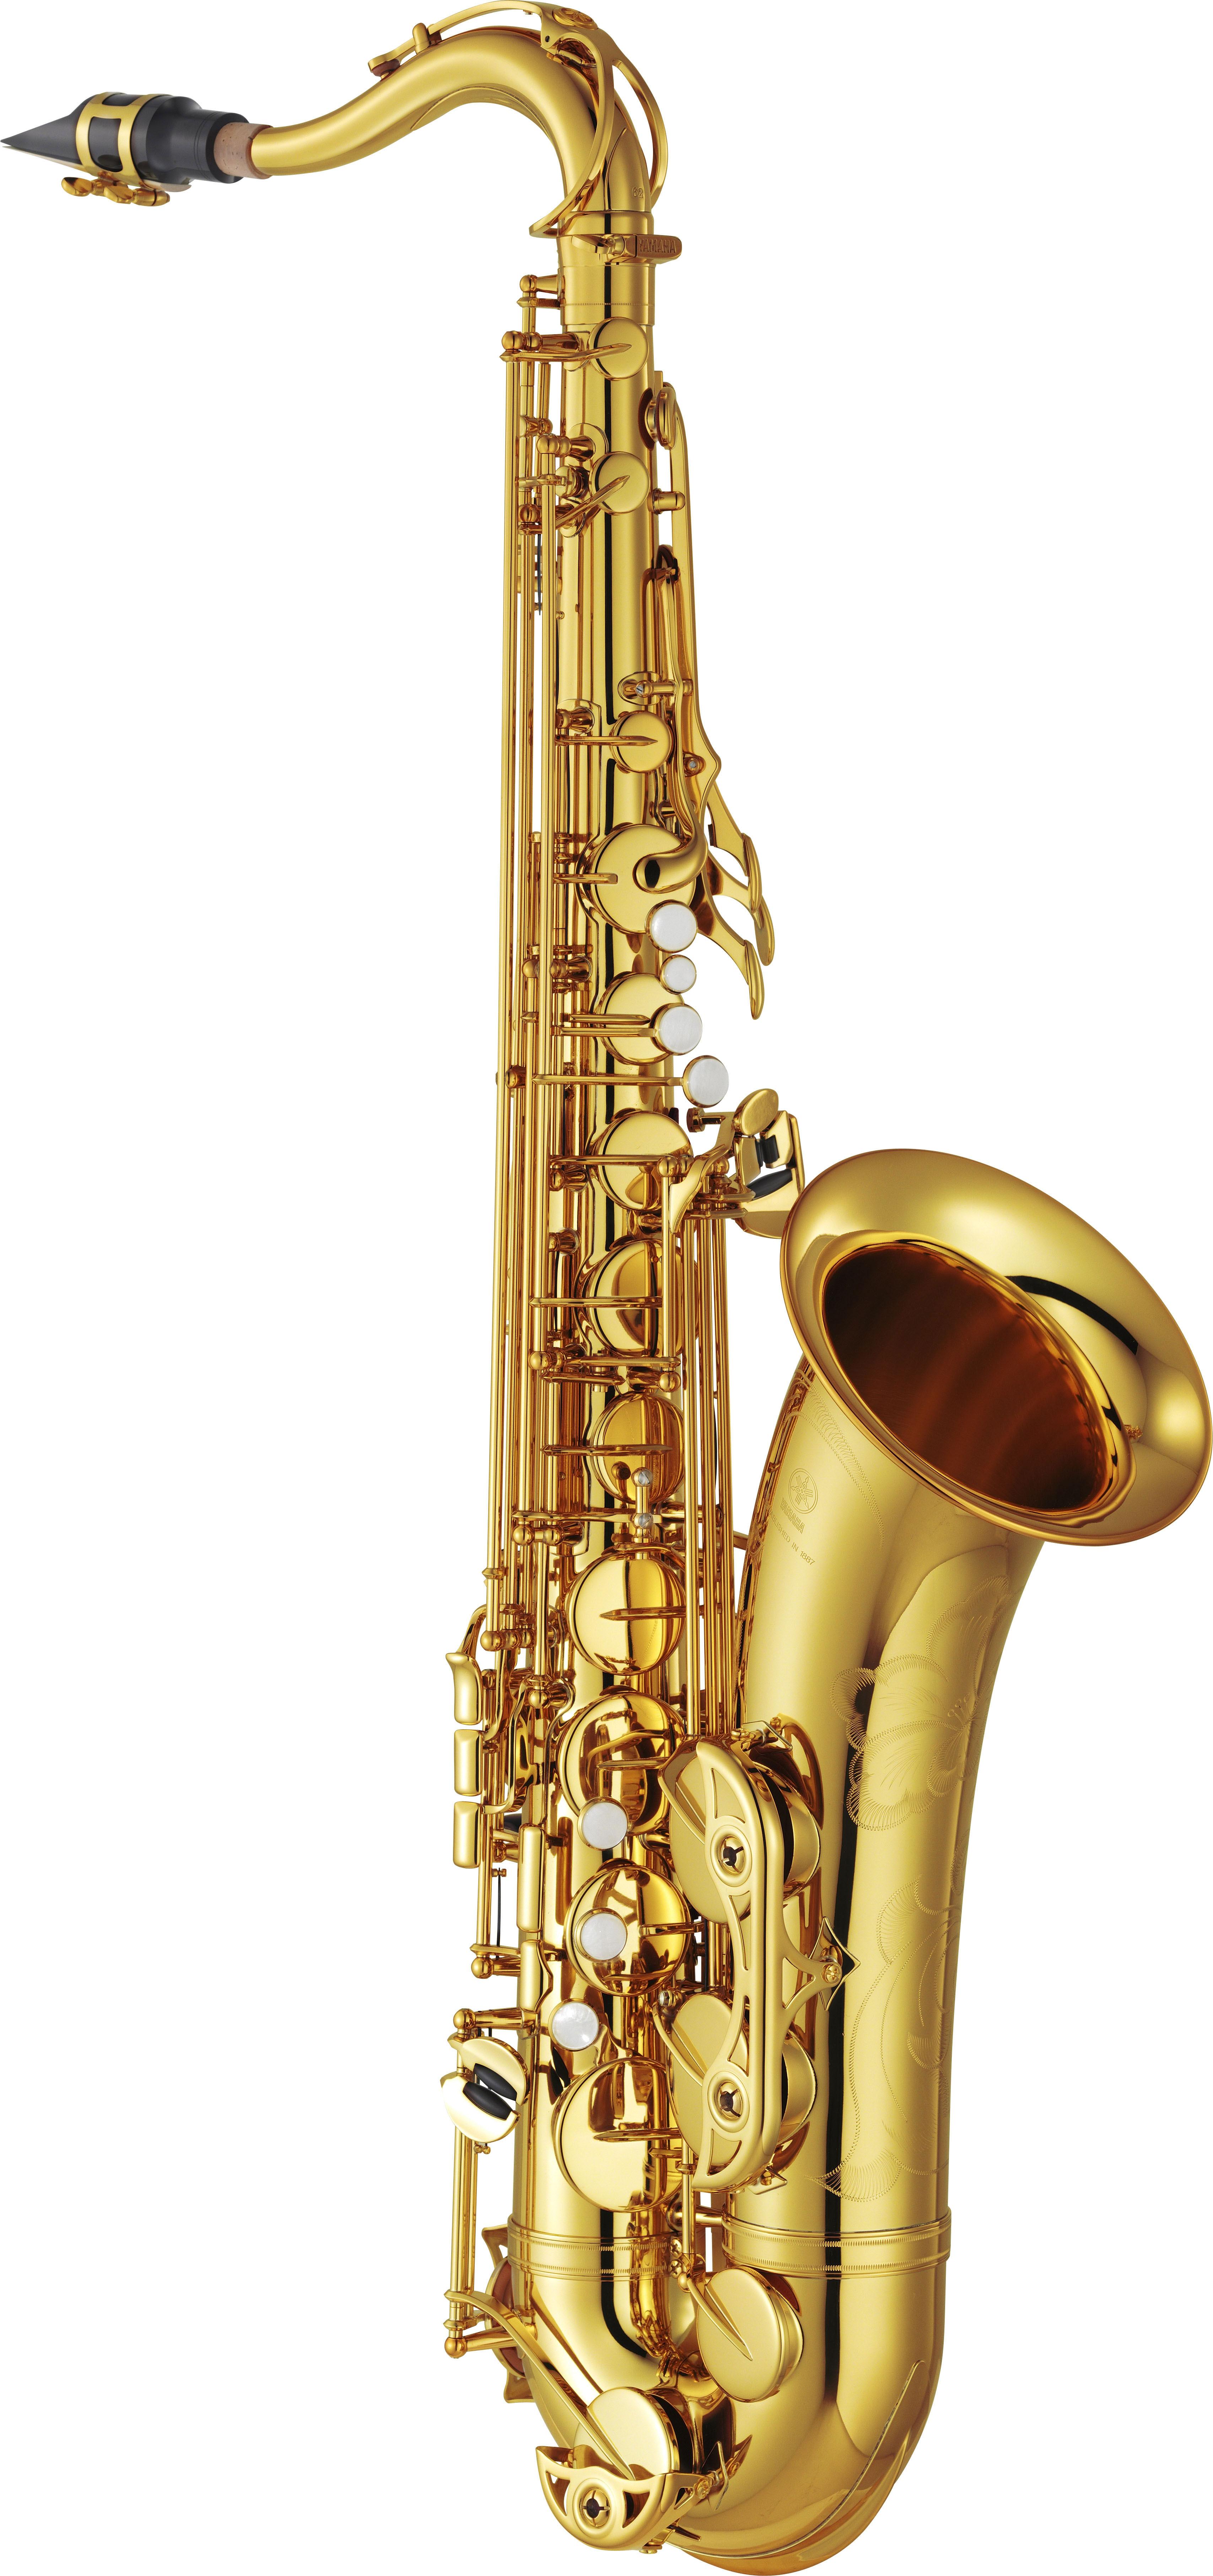 yamaha c yts 62 02 saxophone tenor verni avec tui et bec. Black Bedroom Furniture Sets. Home Design Ideas